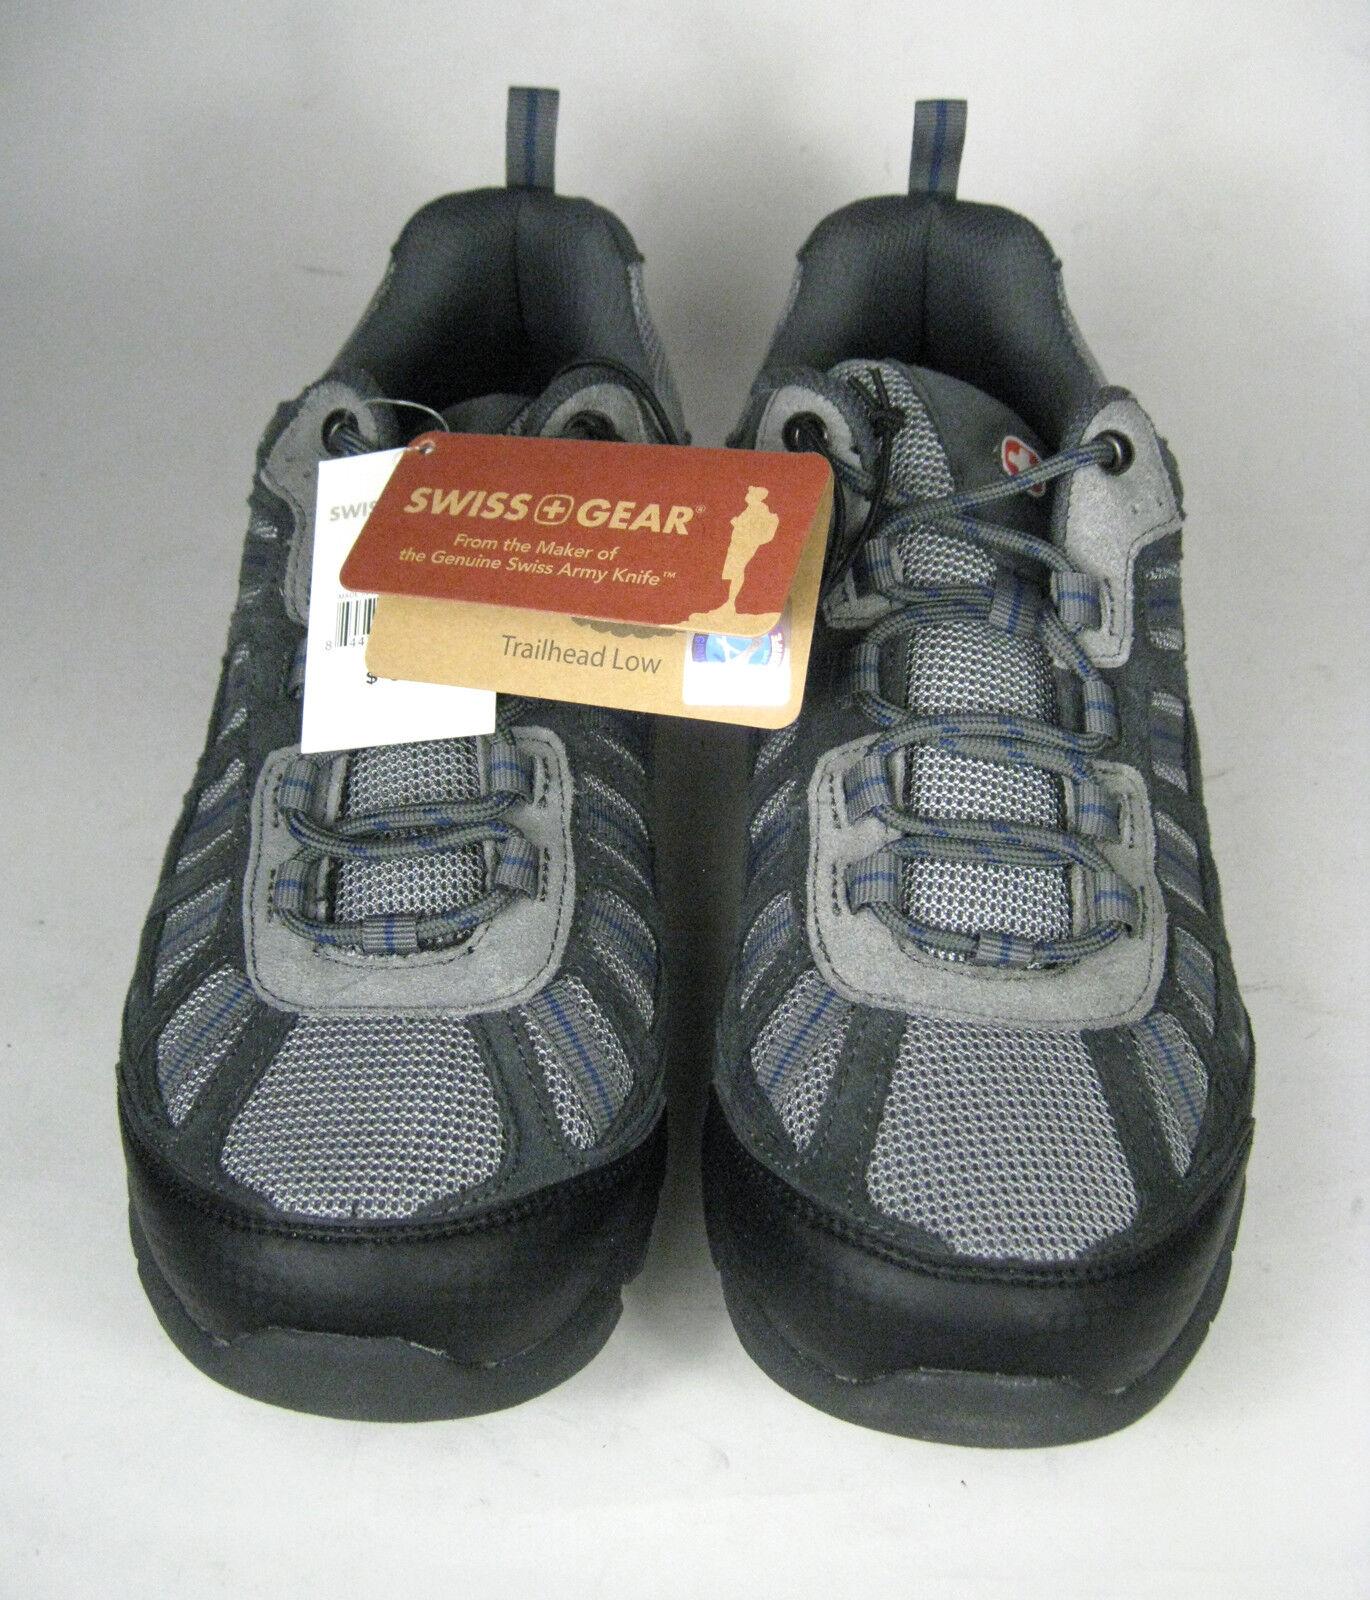 Swiss Gear Mens Hiking Boots Size 12 US